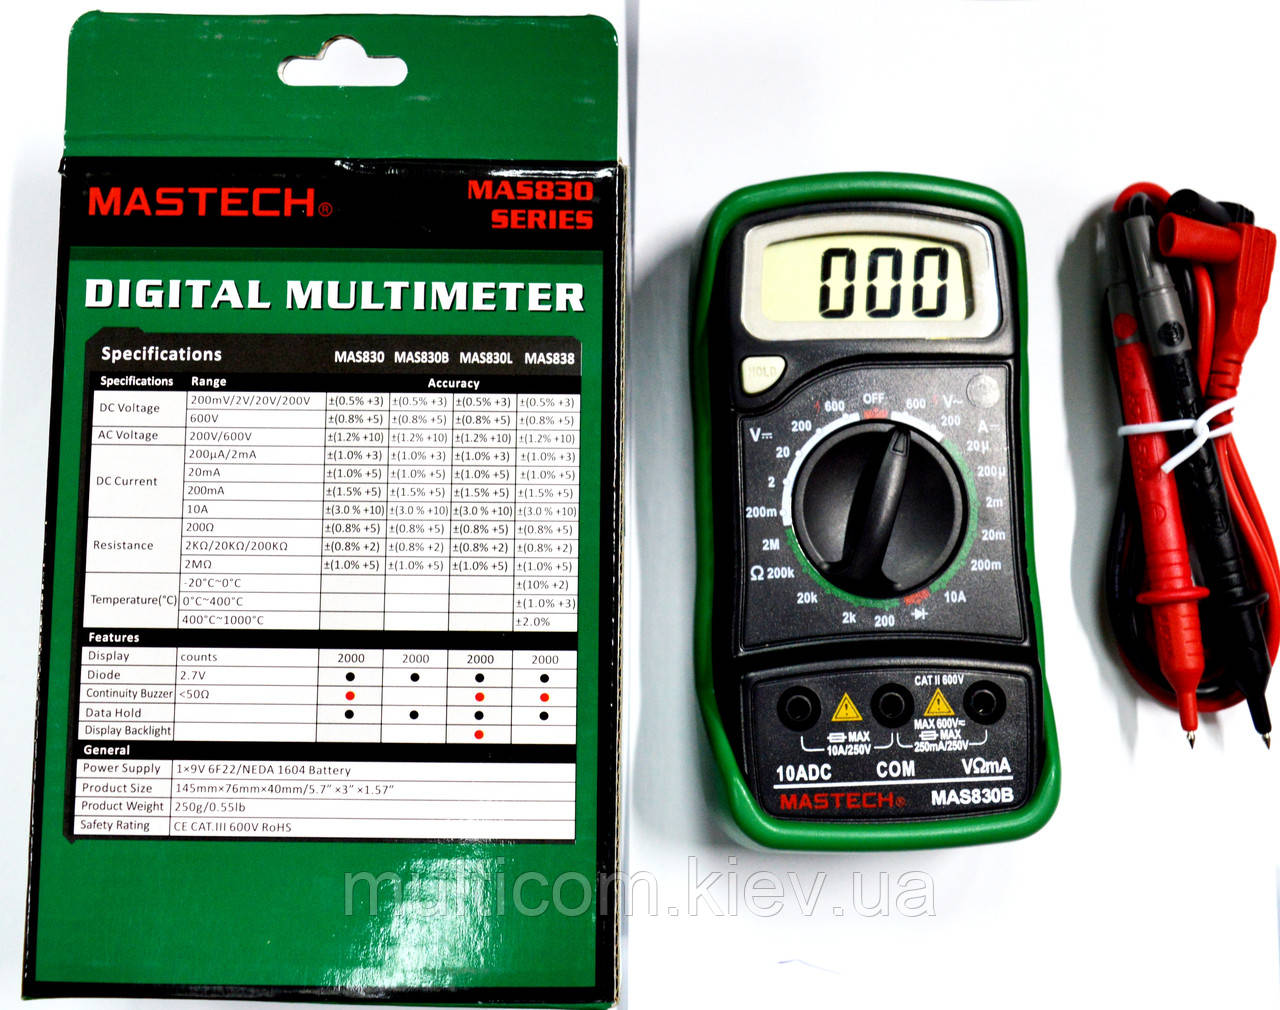 12-13-012. Цифровой мультиметр Mastech MAS830B